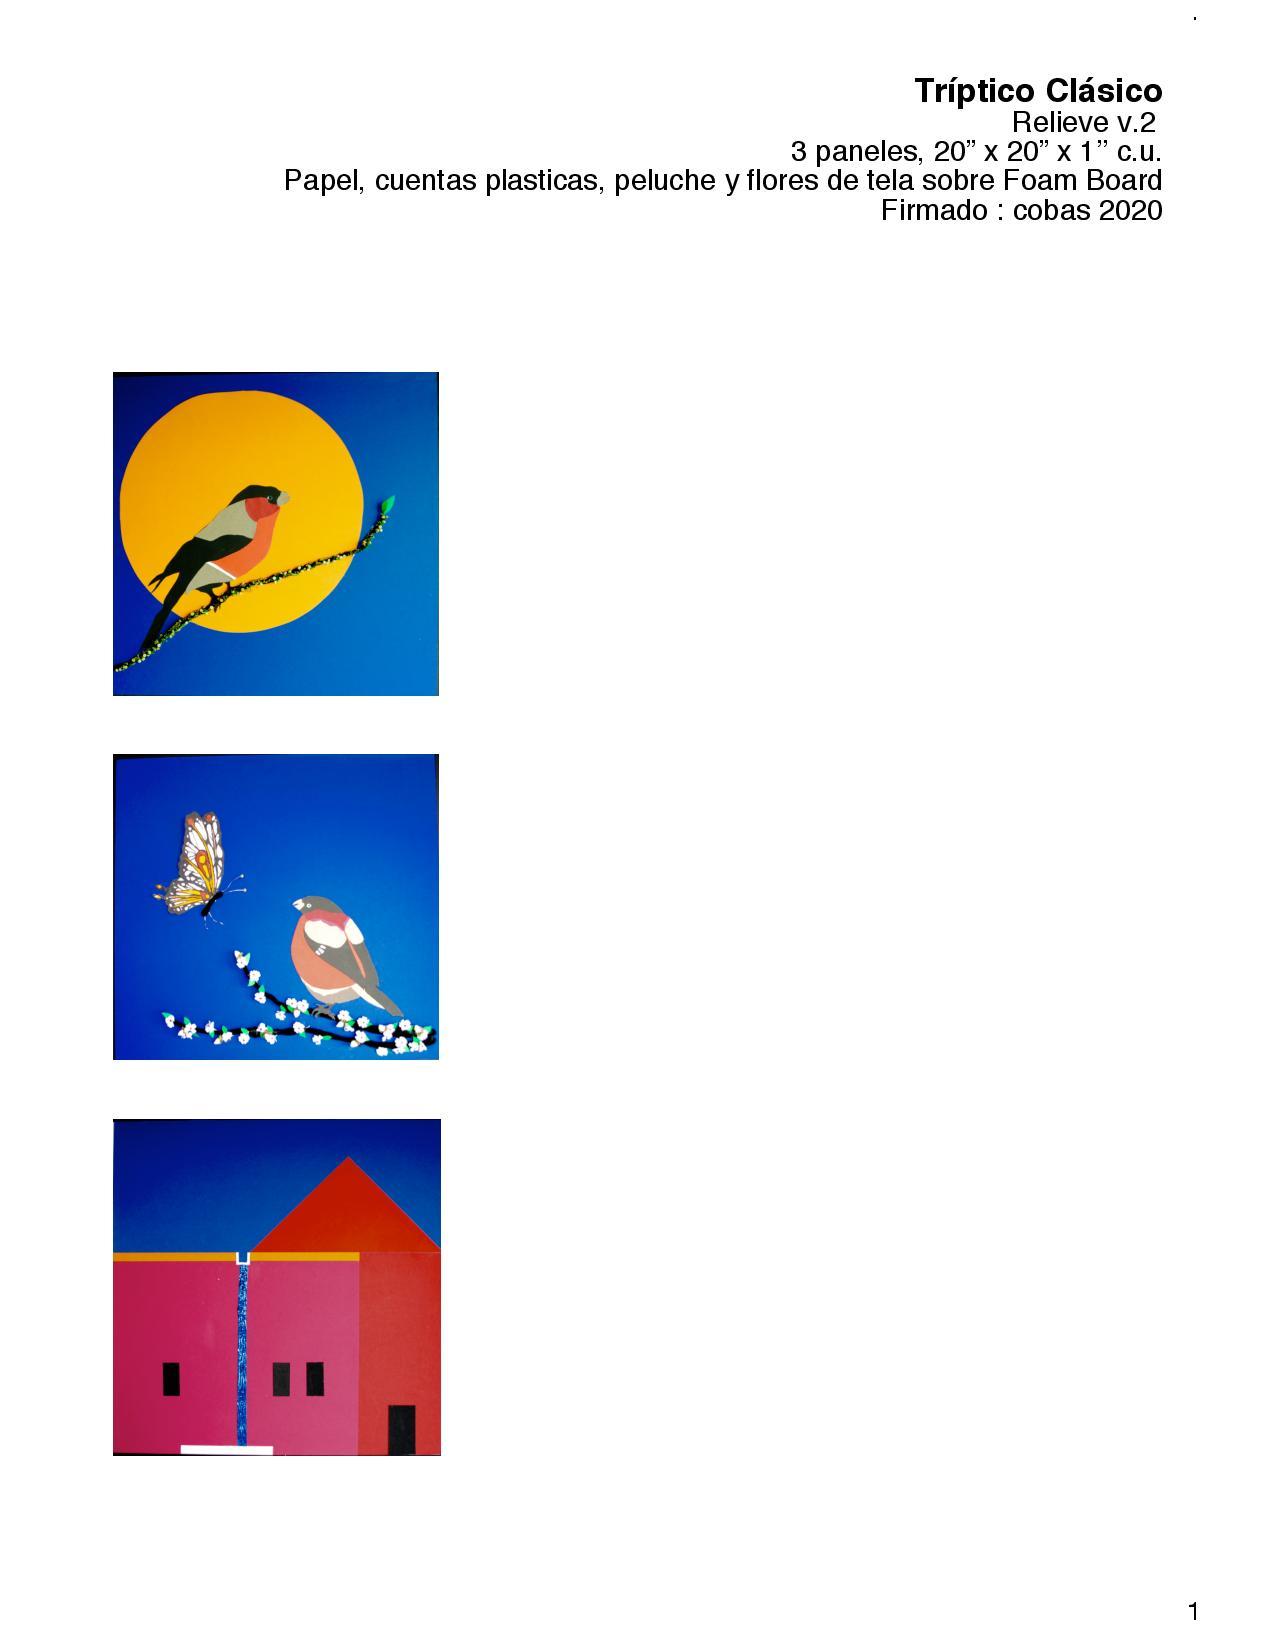 Fcha Técnica _ Triptico Clasico_v.2 (1)-page-001